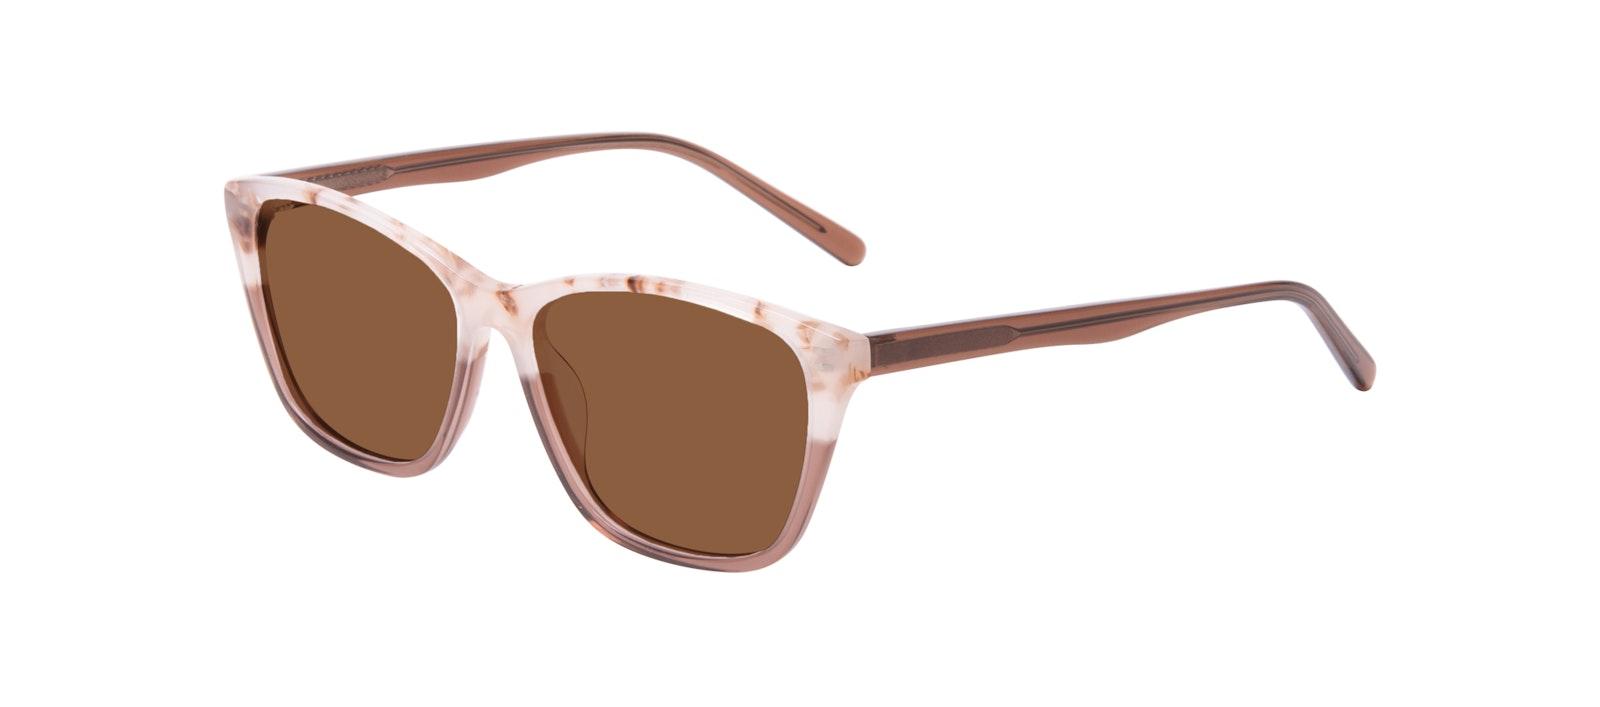 Affordable Fashion Glasses Cat Eye Rectangle Sunglasses Women Myrtle Frosted Sand Tilt